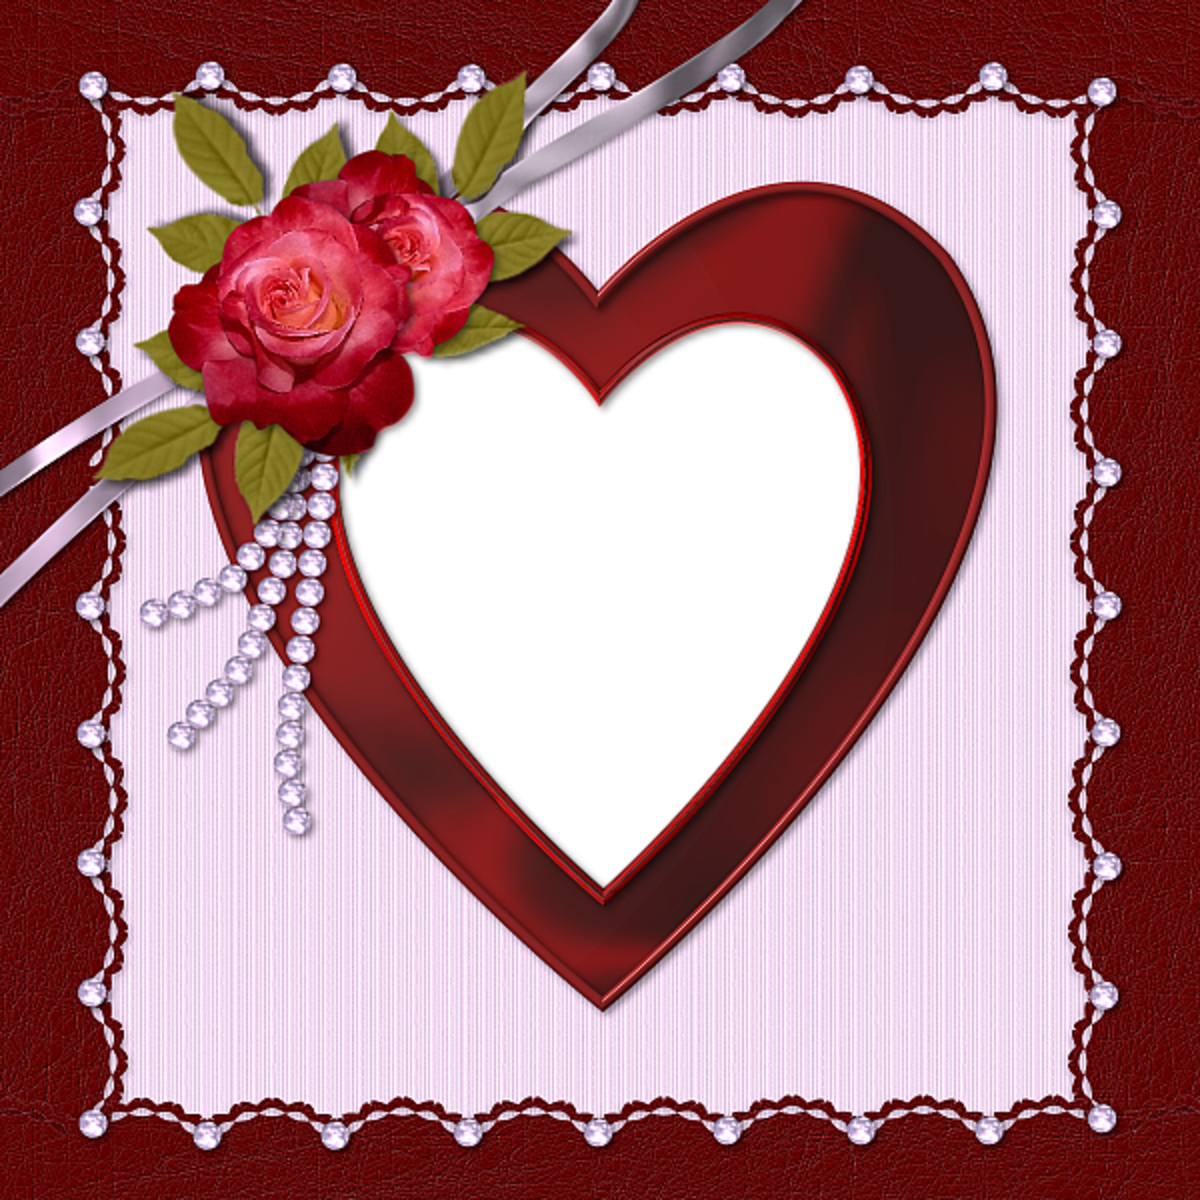 Deep Red Heart photo frame